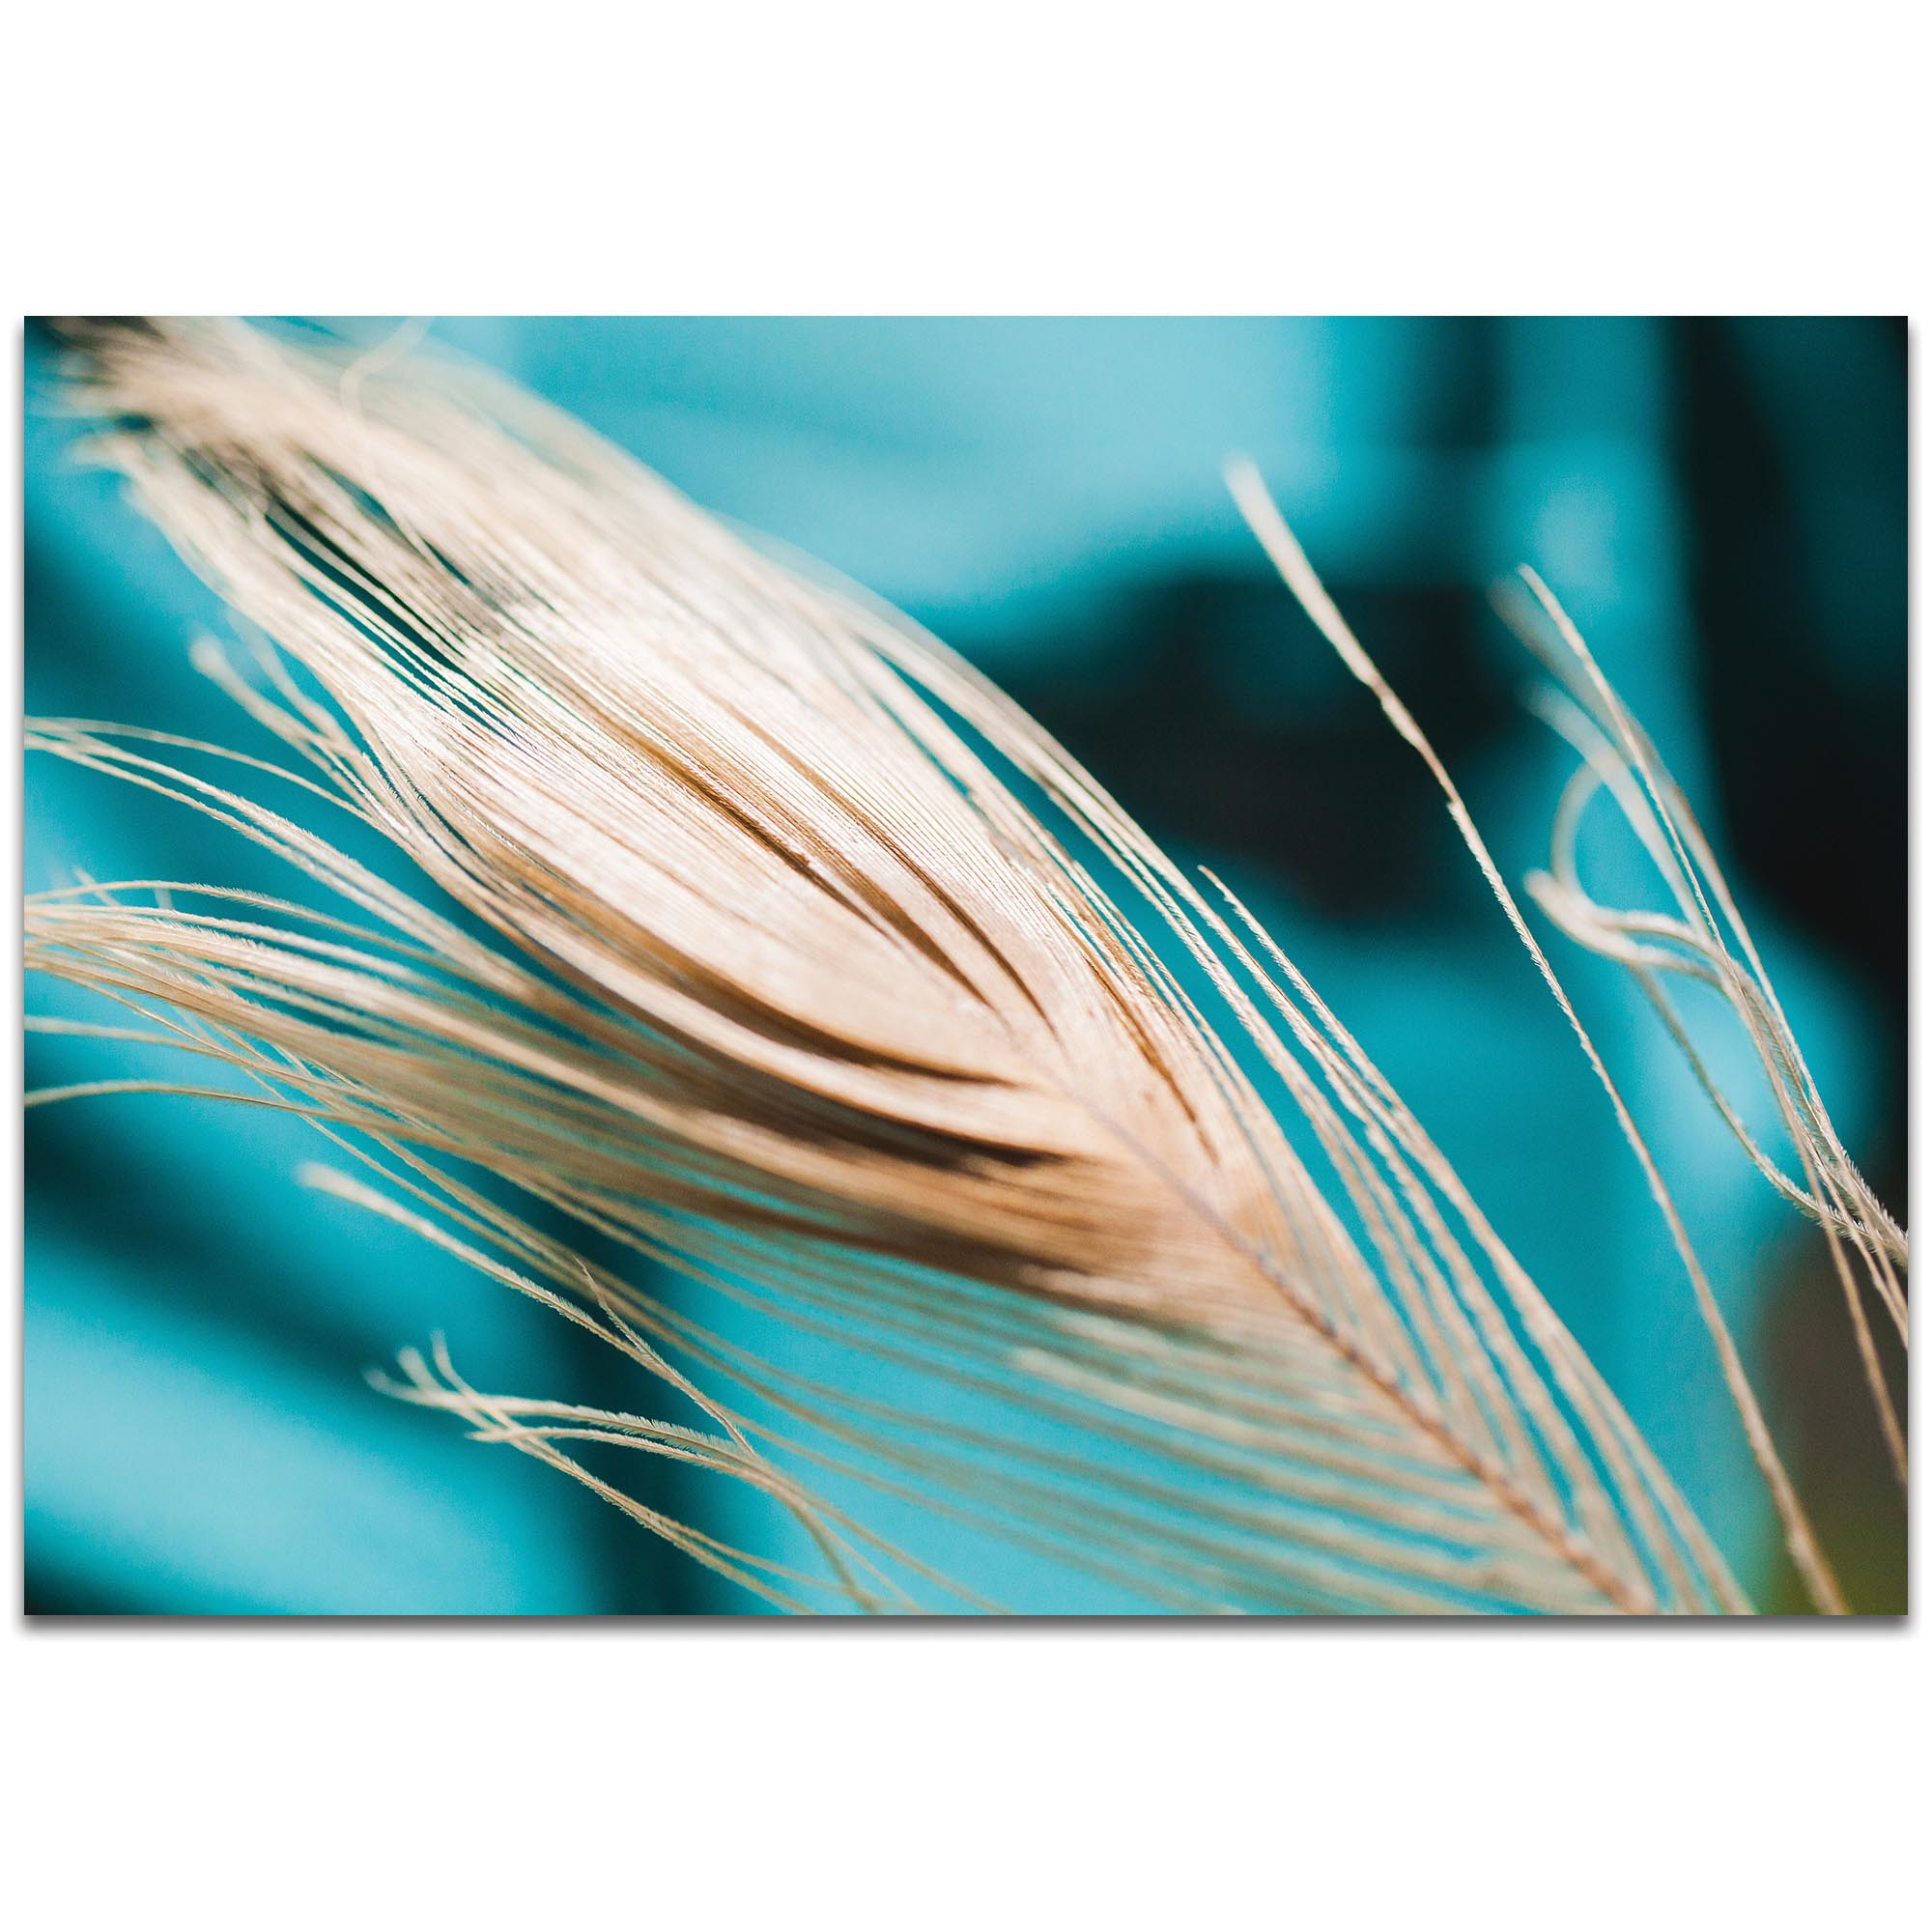 Nature Photography 'Turqoise Feather' - Bird Feathers Art on Metal or Plexiglass